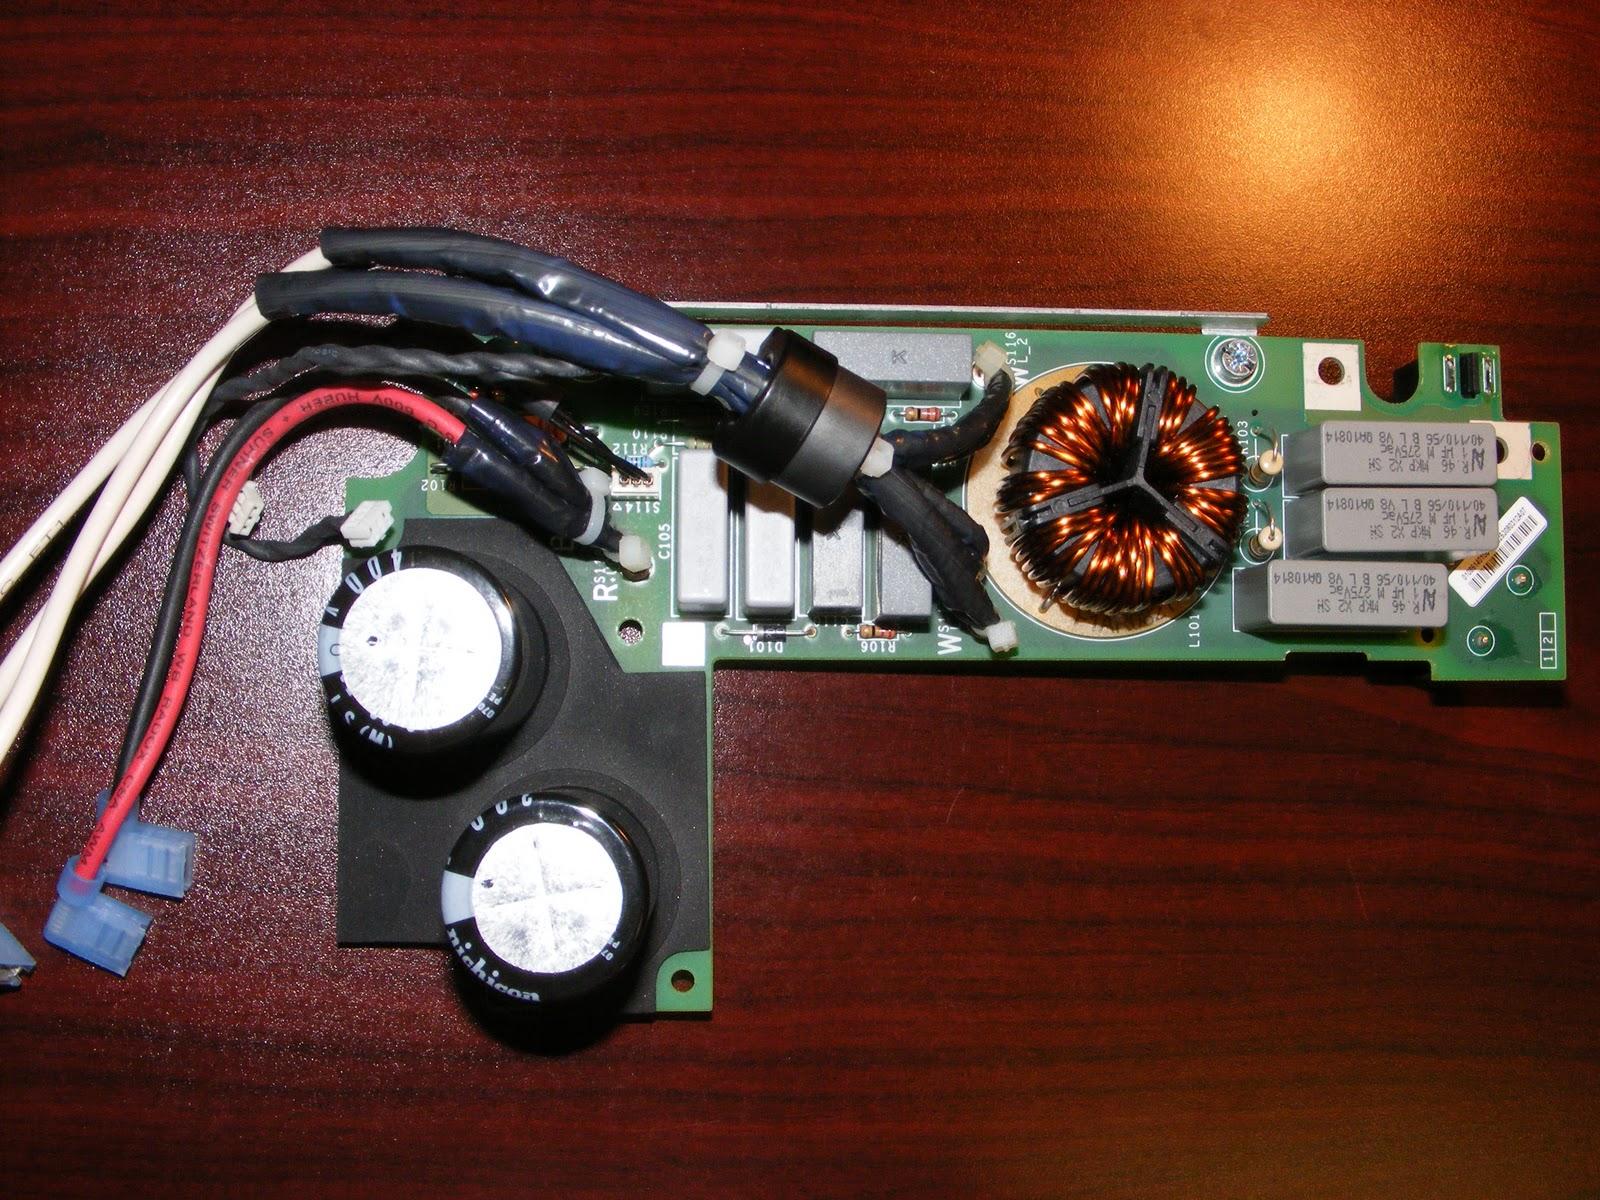 Motor Control Photos Vfd Conformal Coating Circuit Board Photo 5 Bottom Of Main